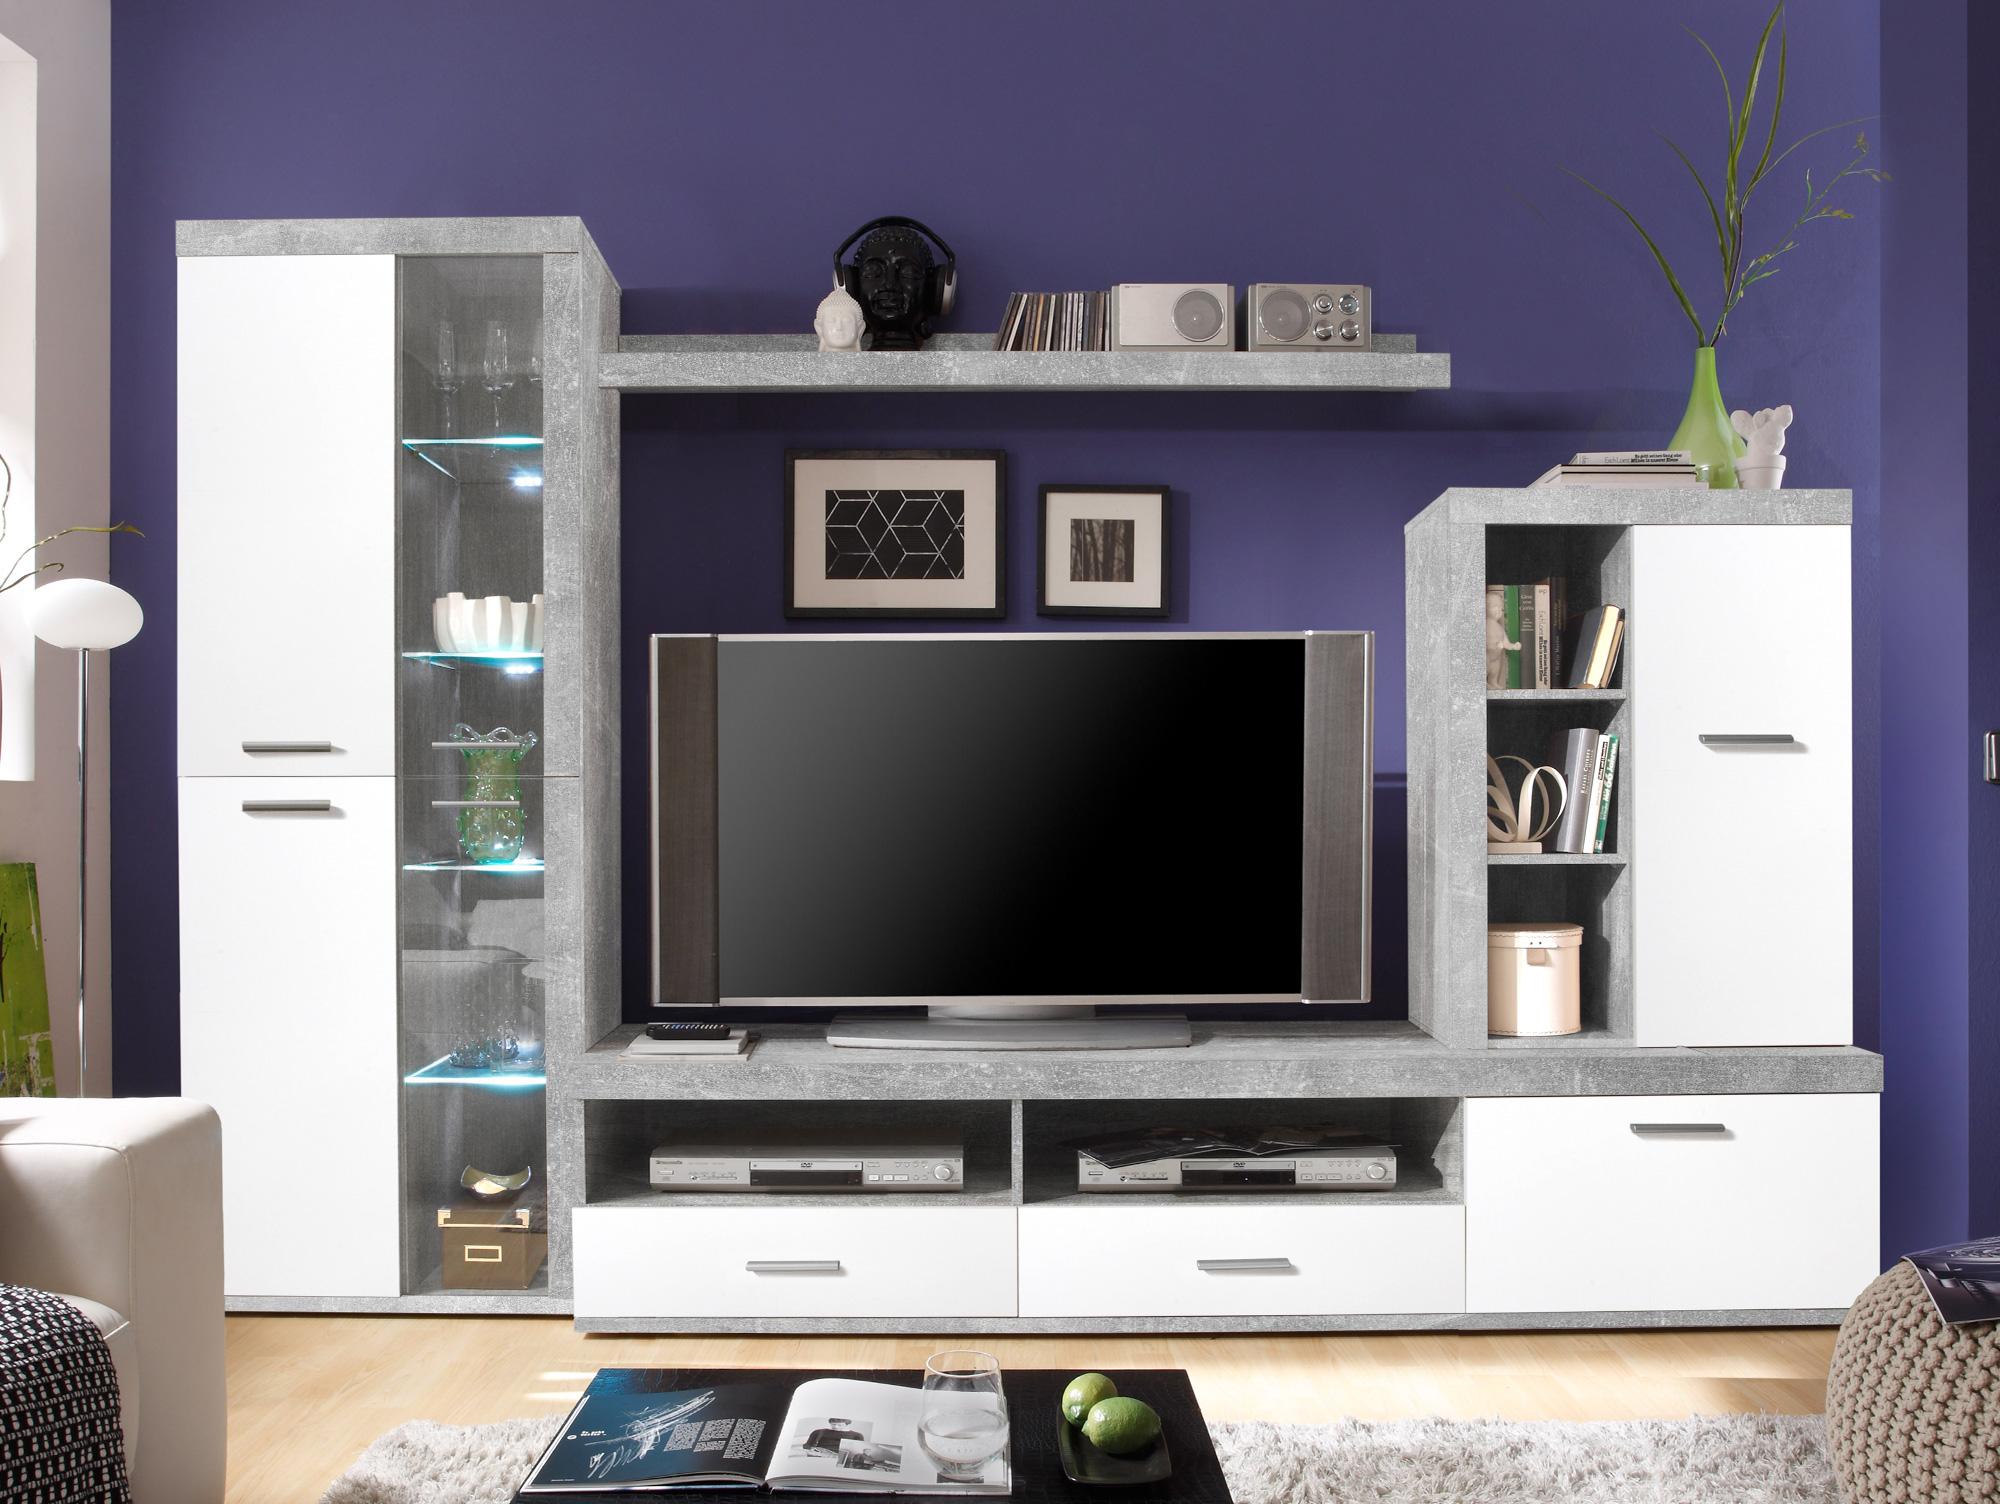 carim wohnwand beton wei. Black Bedroom Furniture Sets. Home Design Ideas